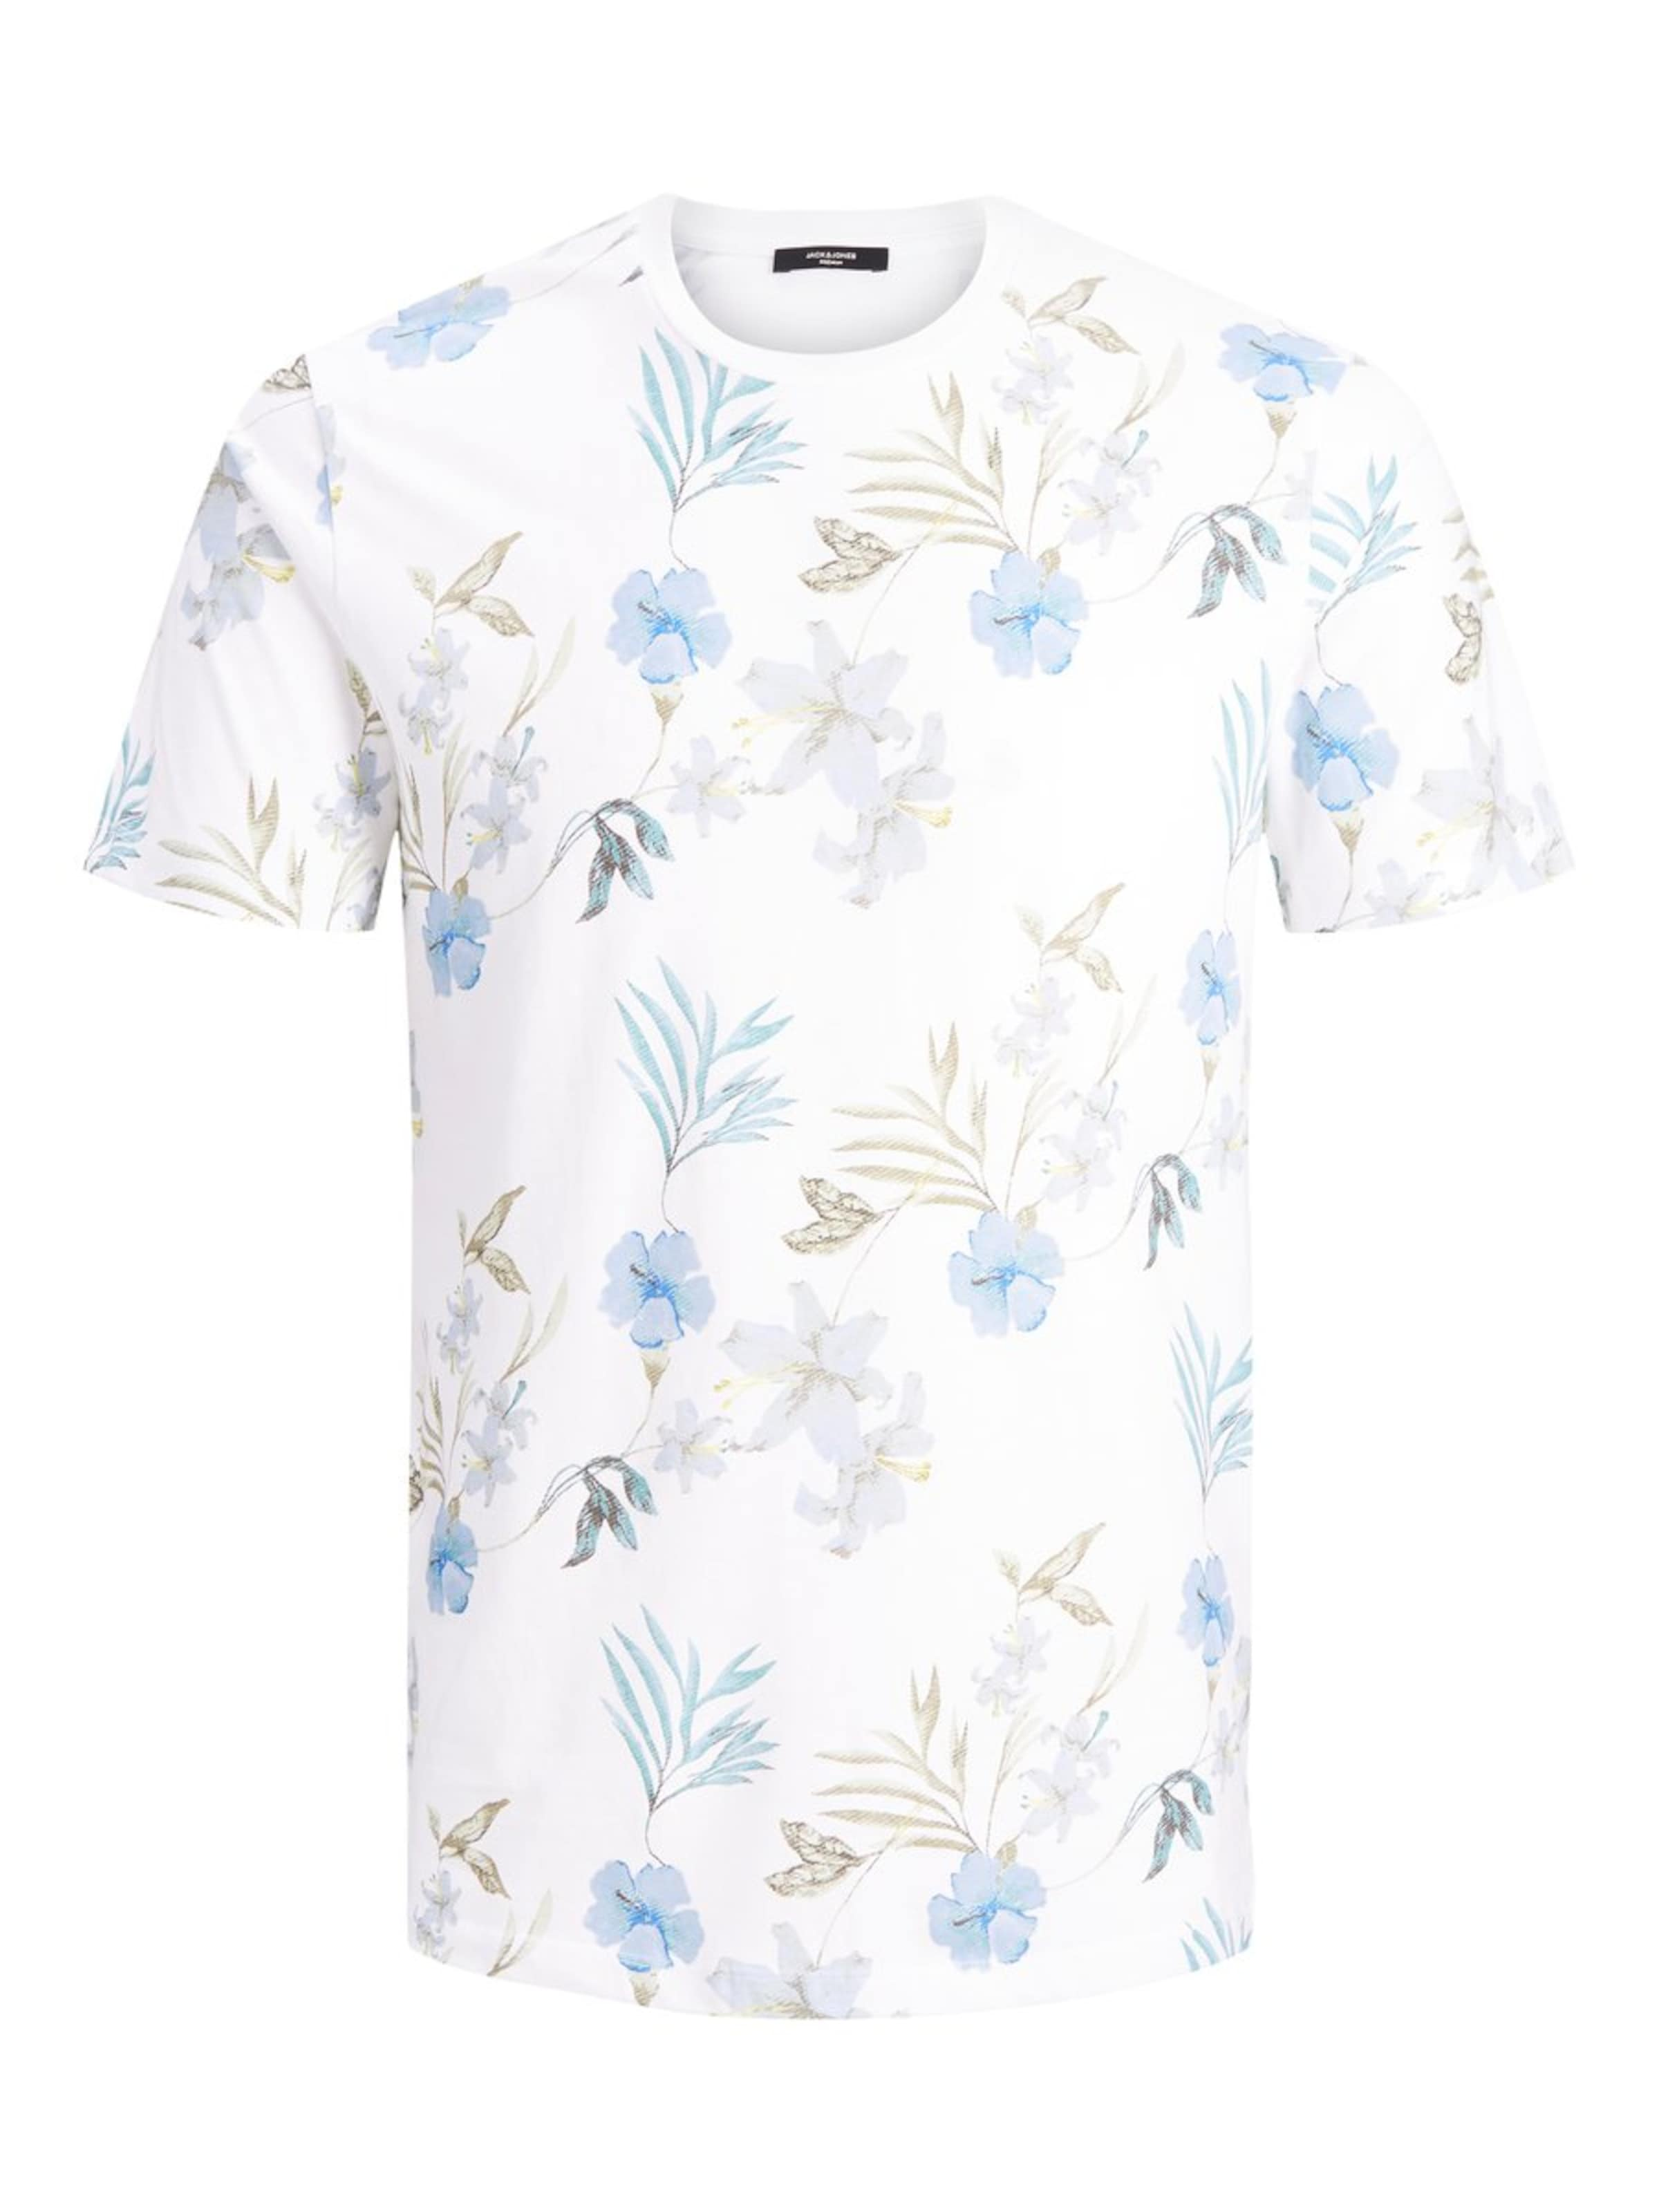 CouleursBlanc shirt T En De Jones Jackamp; Mélange ymYbfgI76v